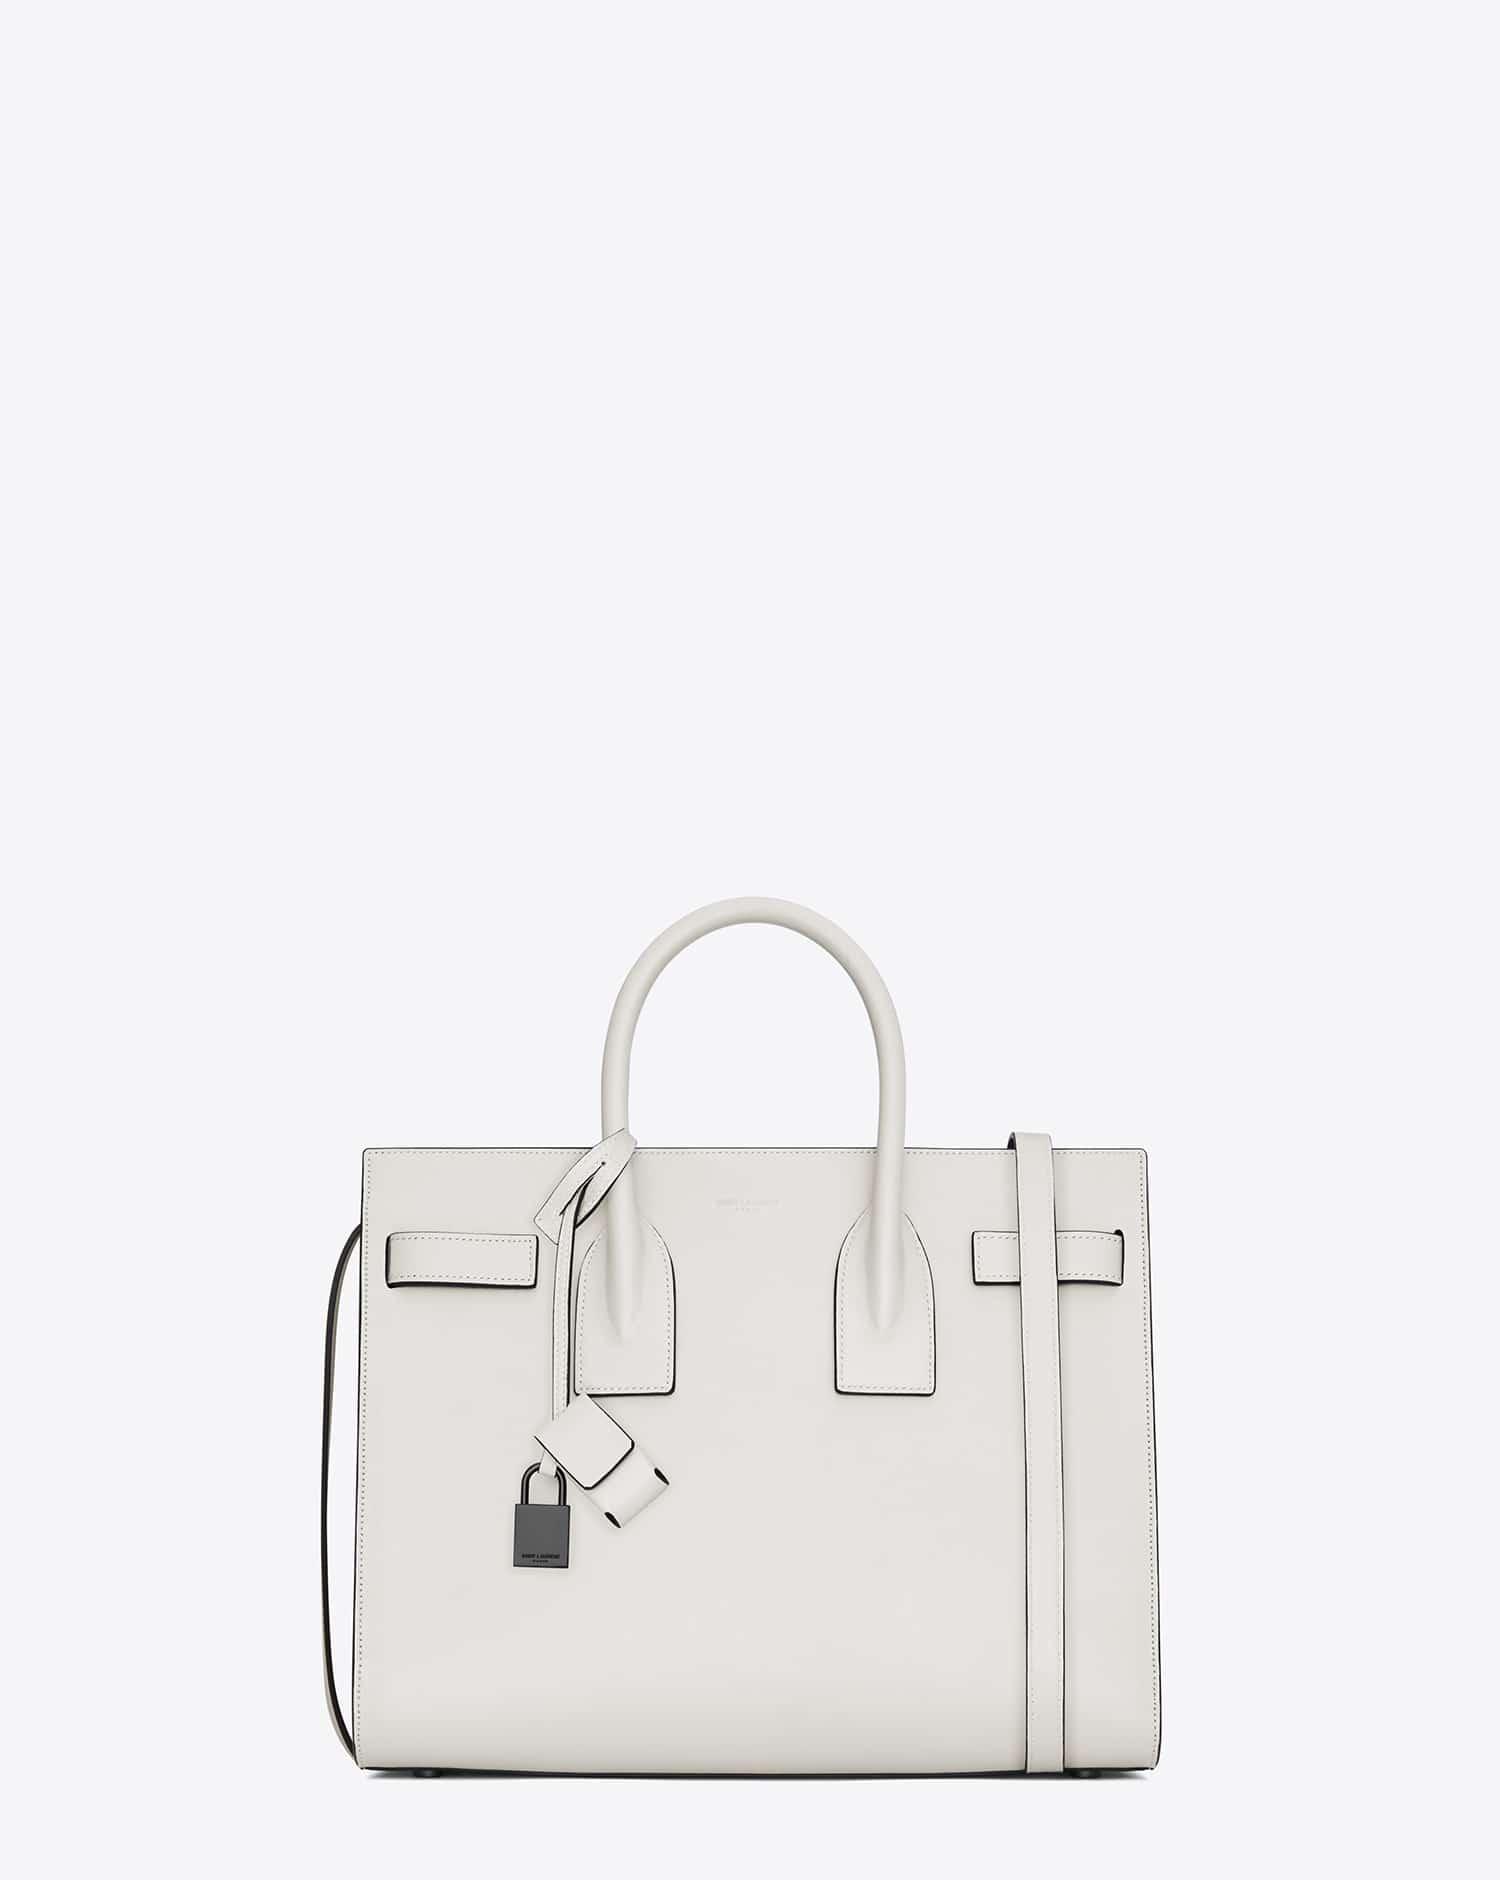 8710c034e70 Saint Laurent Cruise 2017 Bag Collection   Spotted Fashion